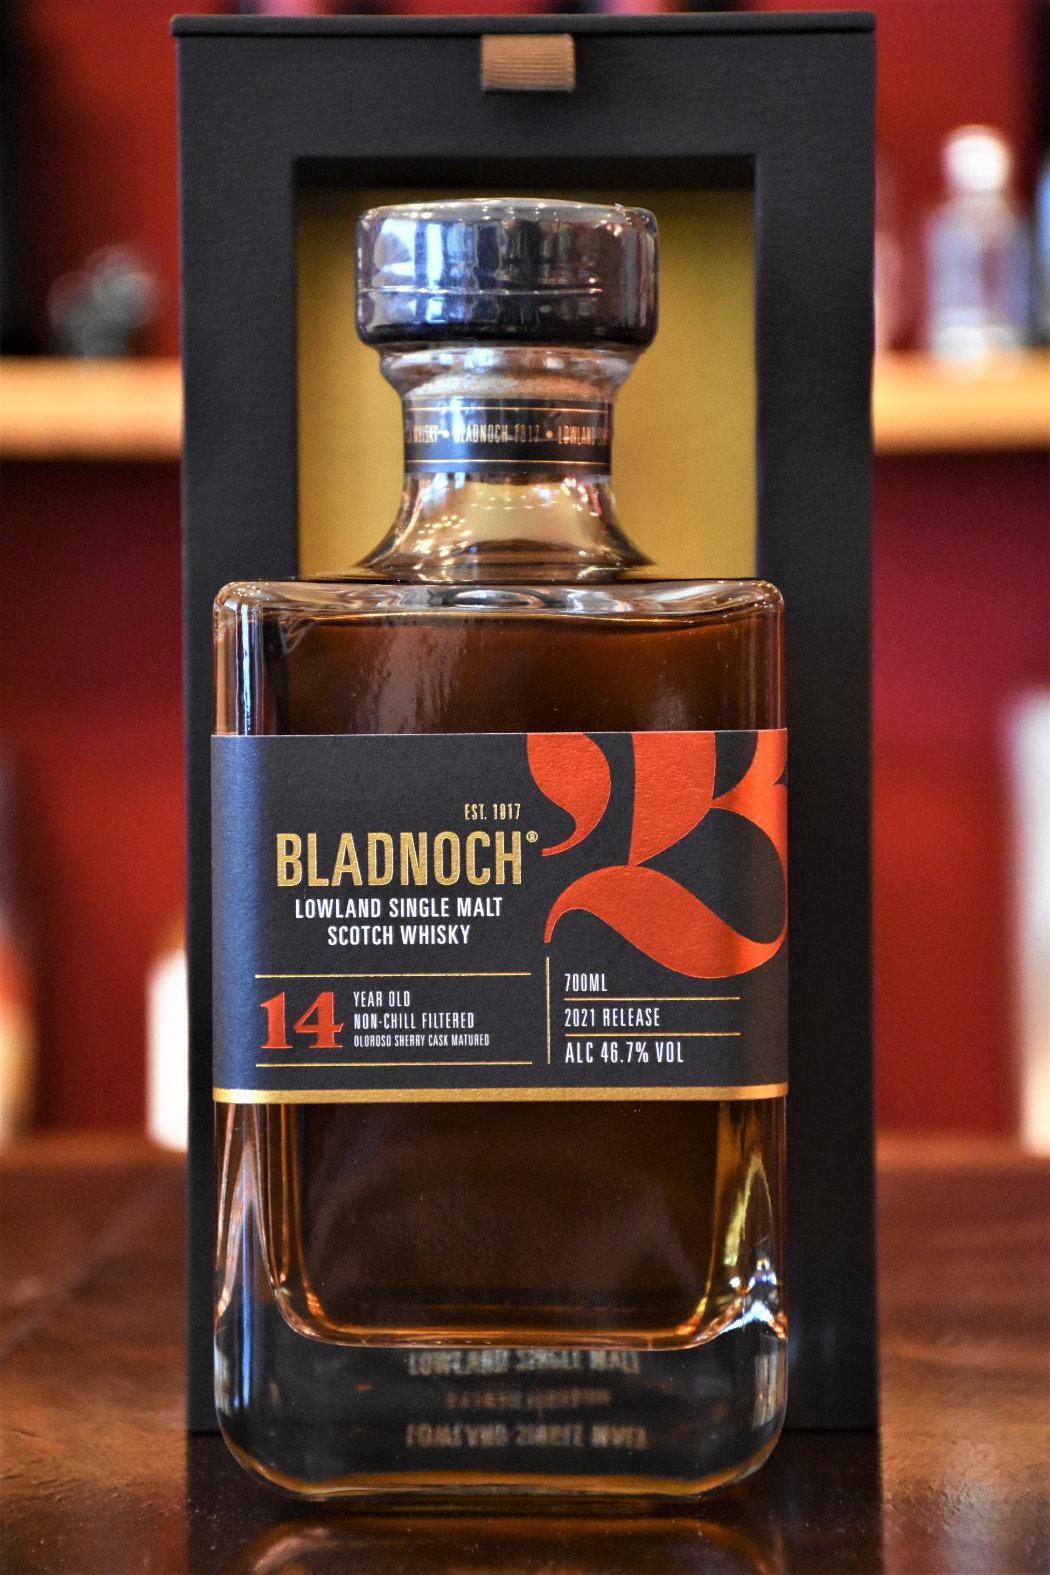 Bladnoch 14 y.o. - Release 2021, Oloroso Sherry Cask, 46,7% Alc.Vol., Distillery Original Bottling